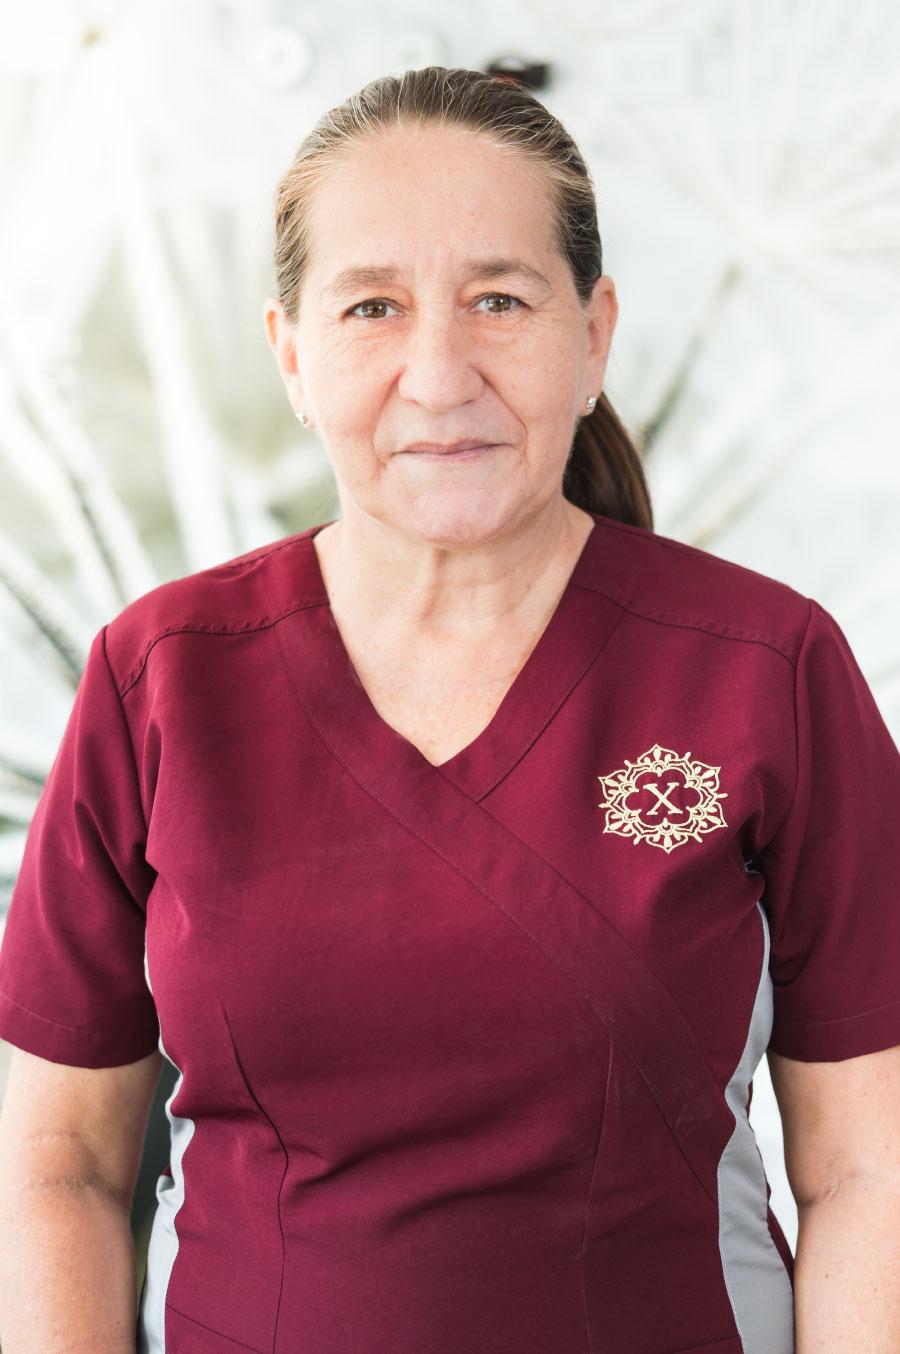 Mónica Ibarra Yañez